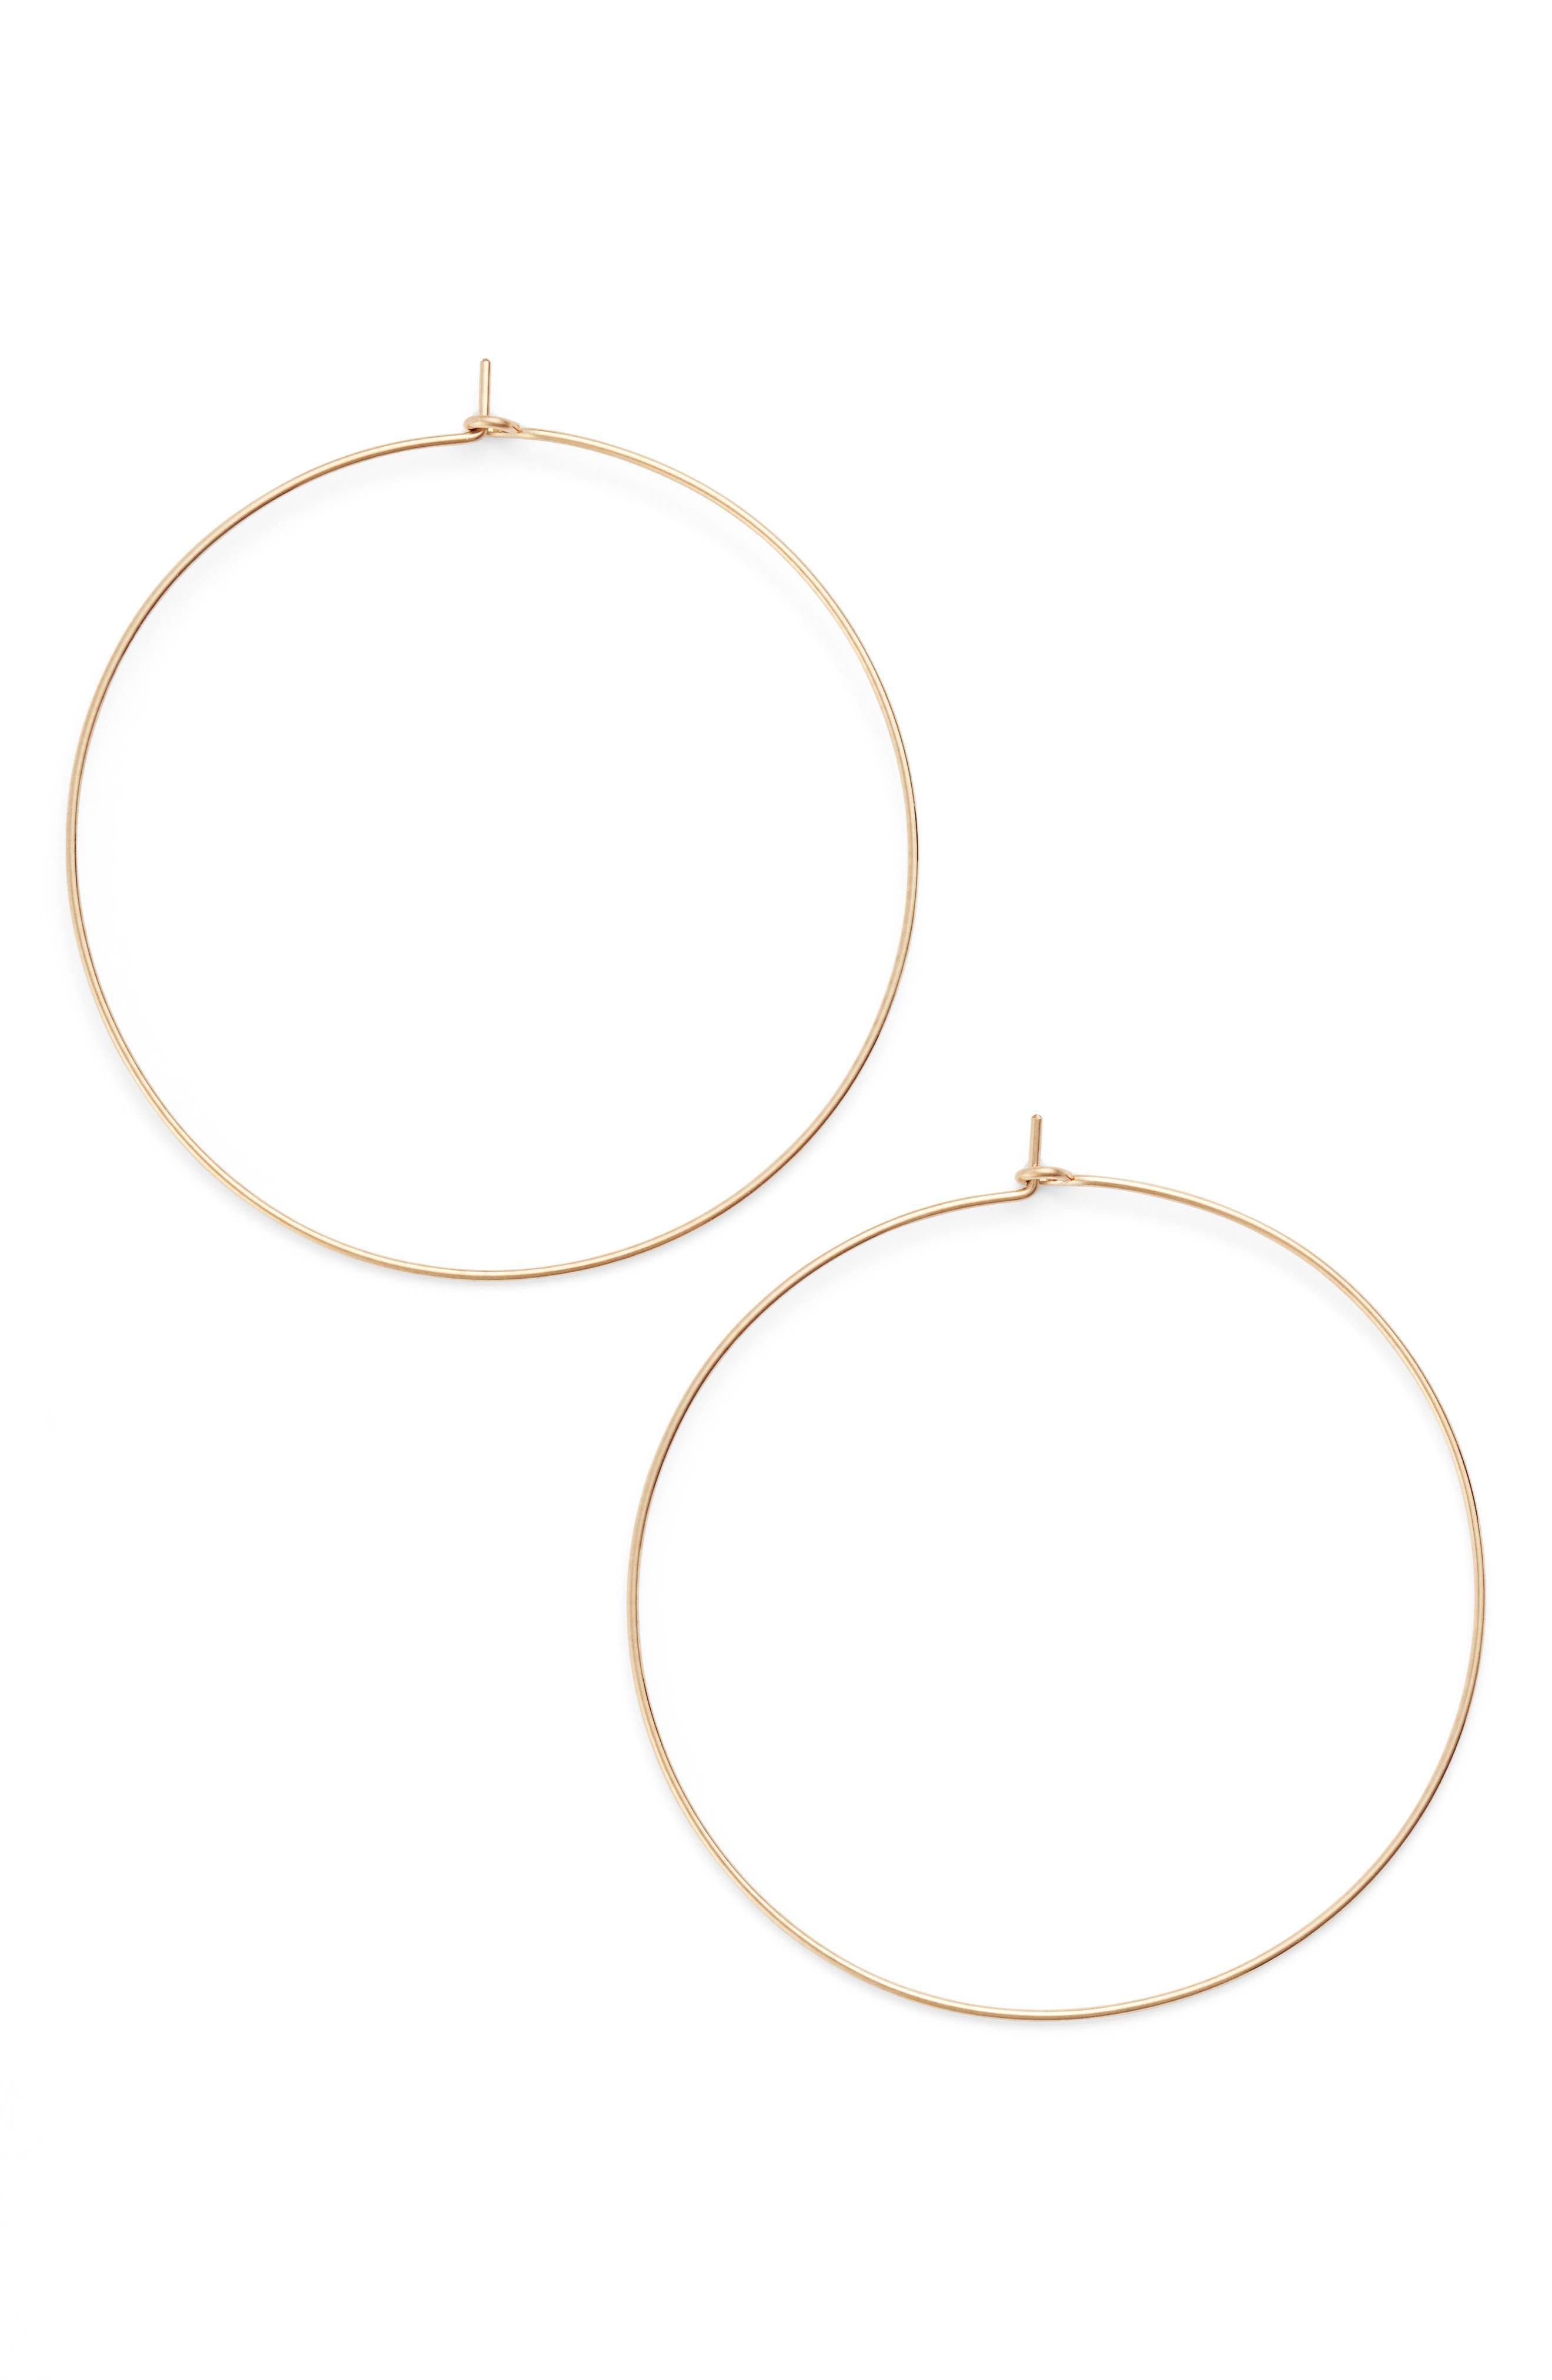 Main Image - Nashelle Extra Large Hoop Earrings